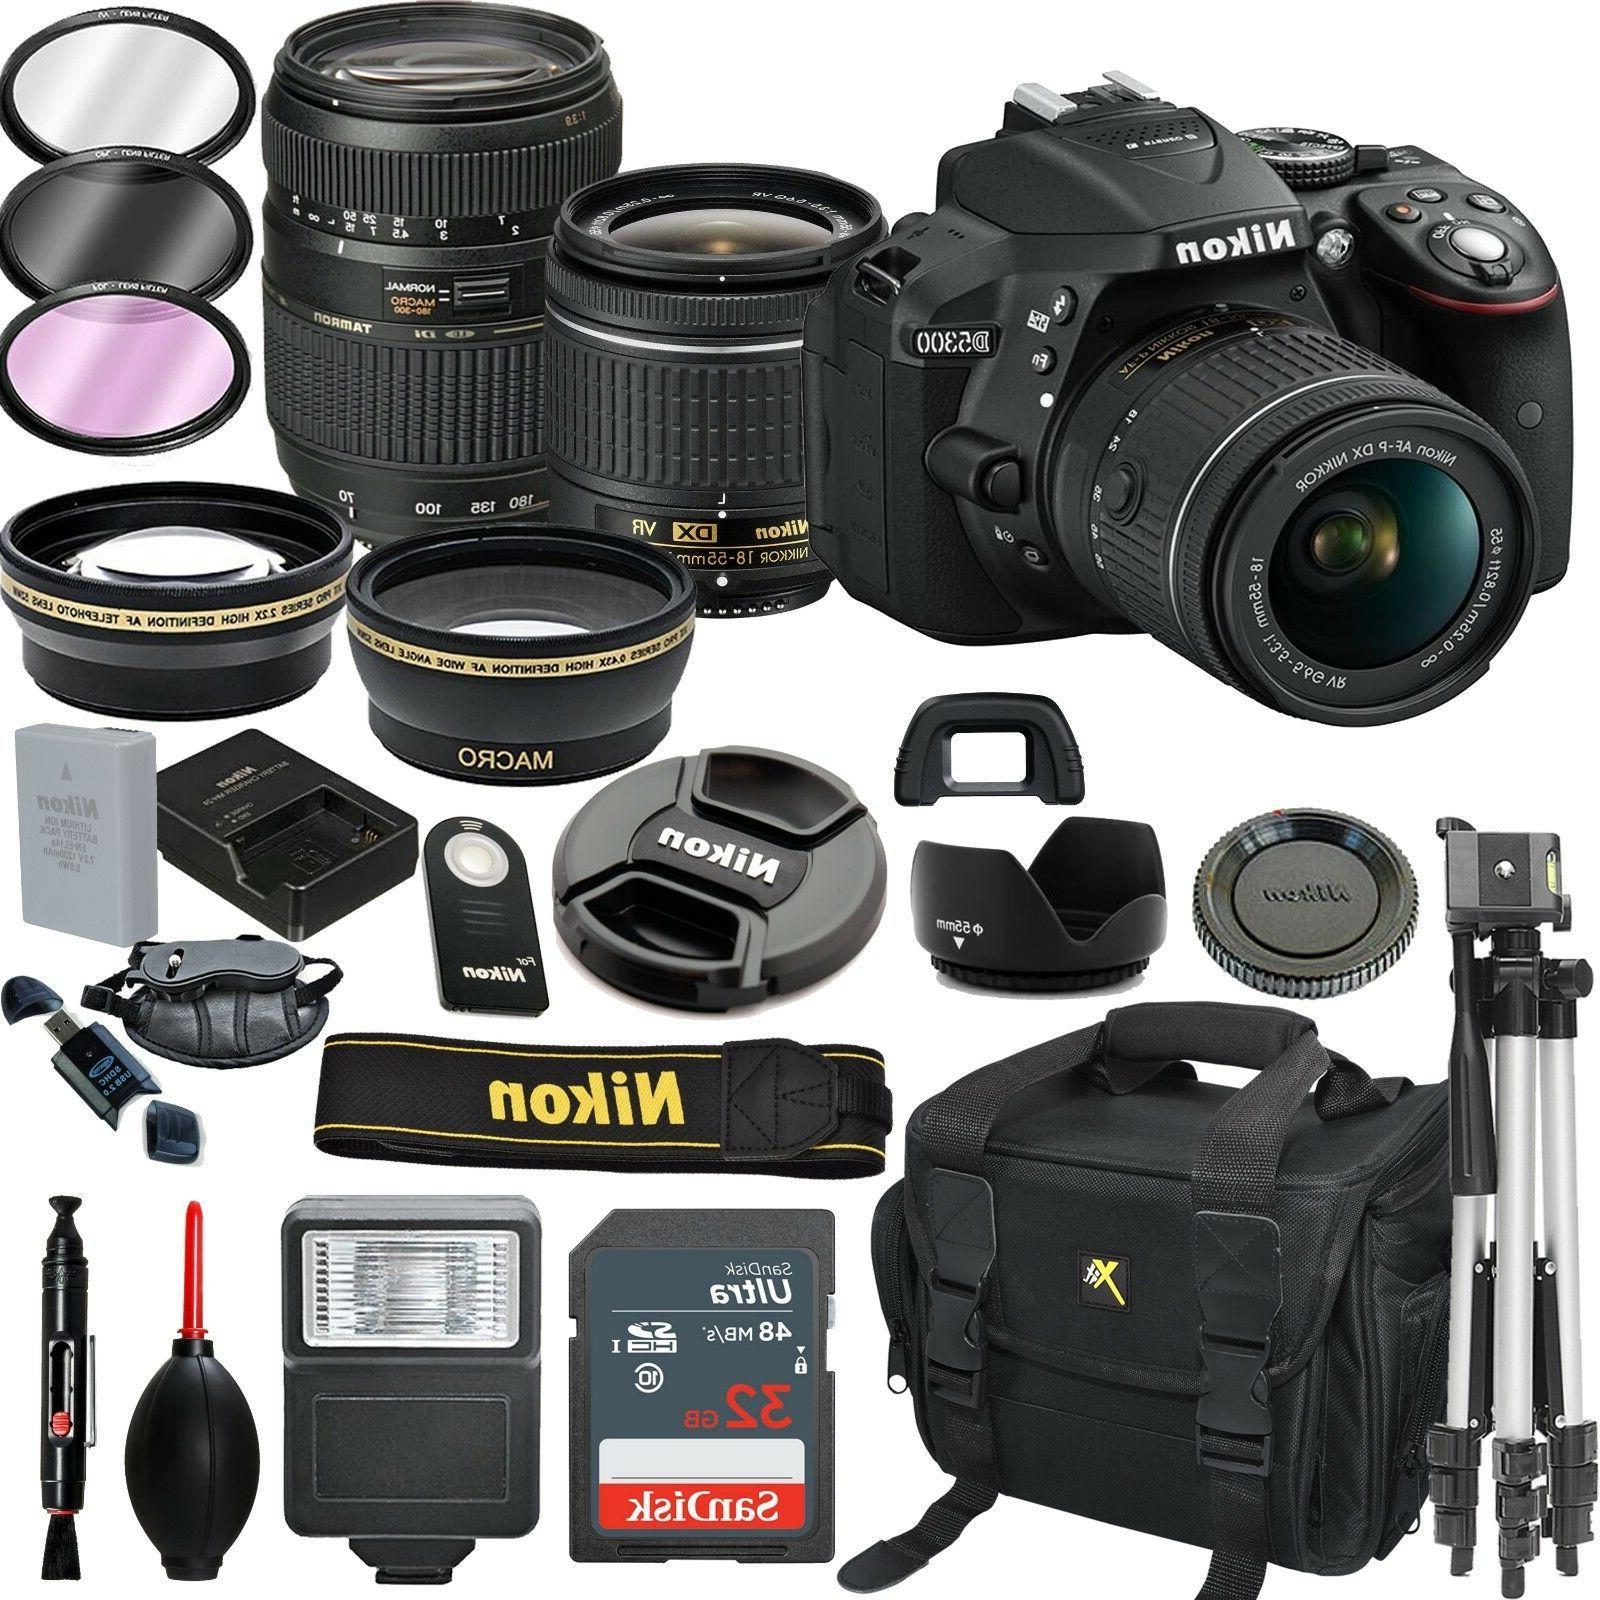 d5300 dslr camera with 18 55mm vr